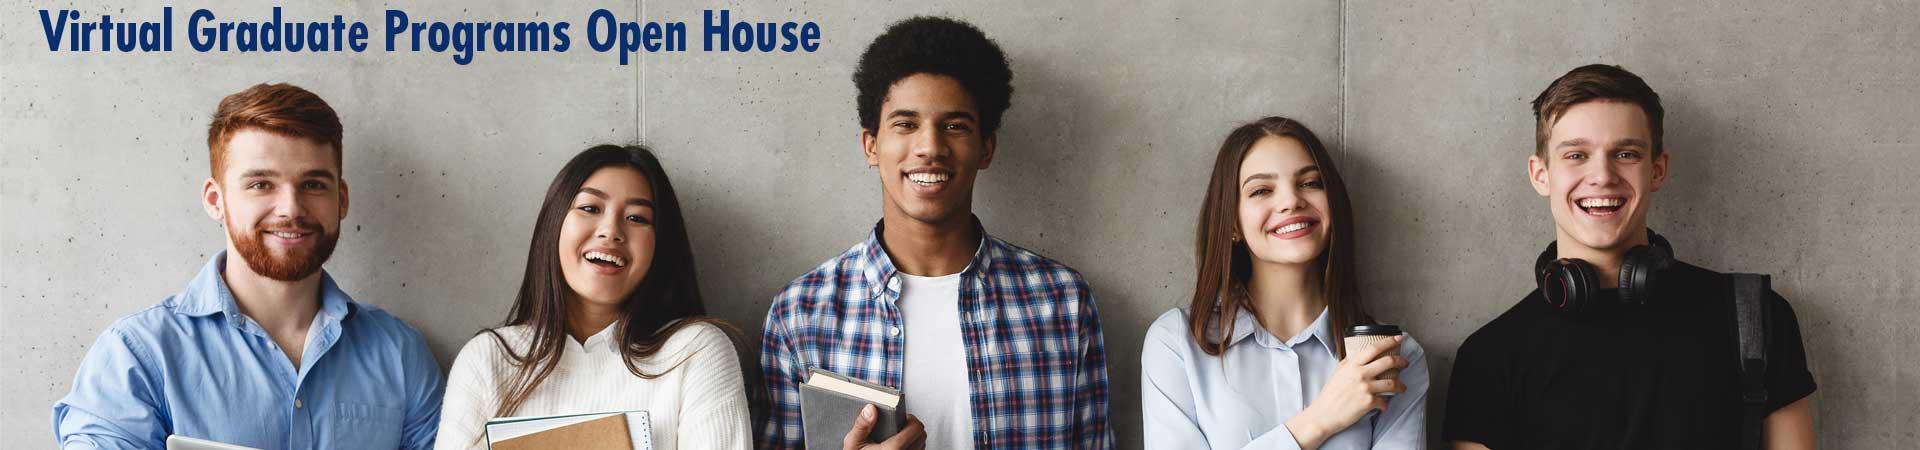 Virtual graduate programs open house